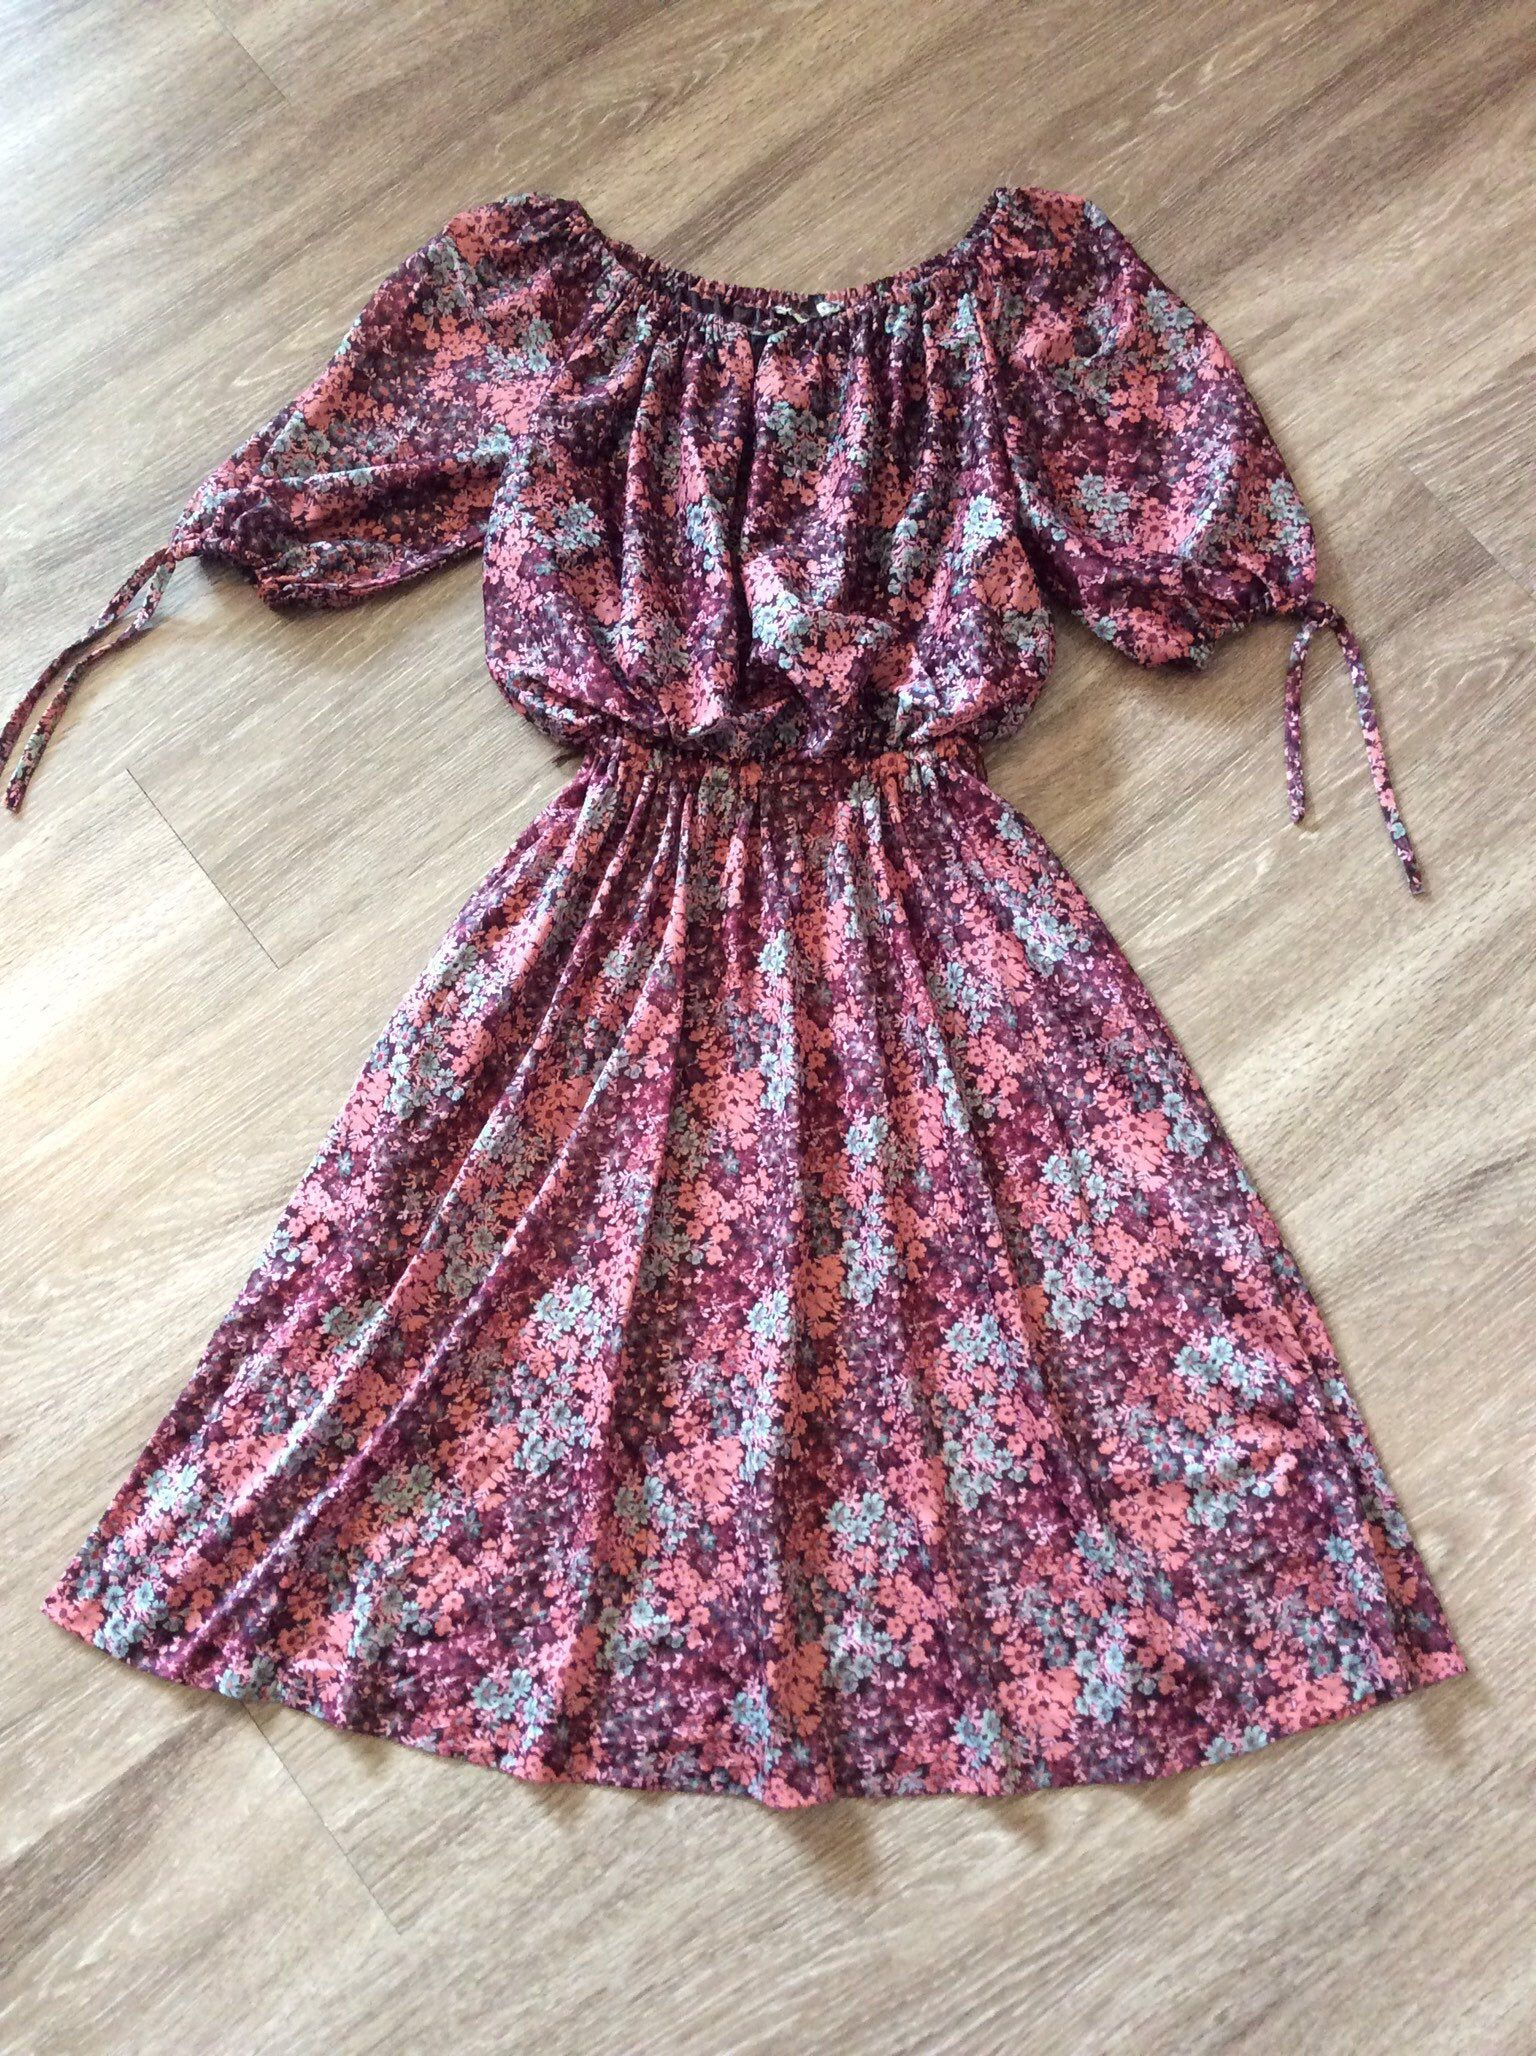 Vintage 70s Summer Dress Floral Sundress Disco Dress Etsy Disco Dress Vintage Summer Fashion Floral Dress Summer [ 2056 x 1536 Pixel ]